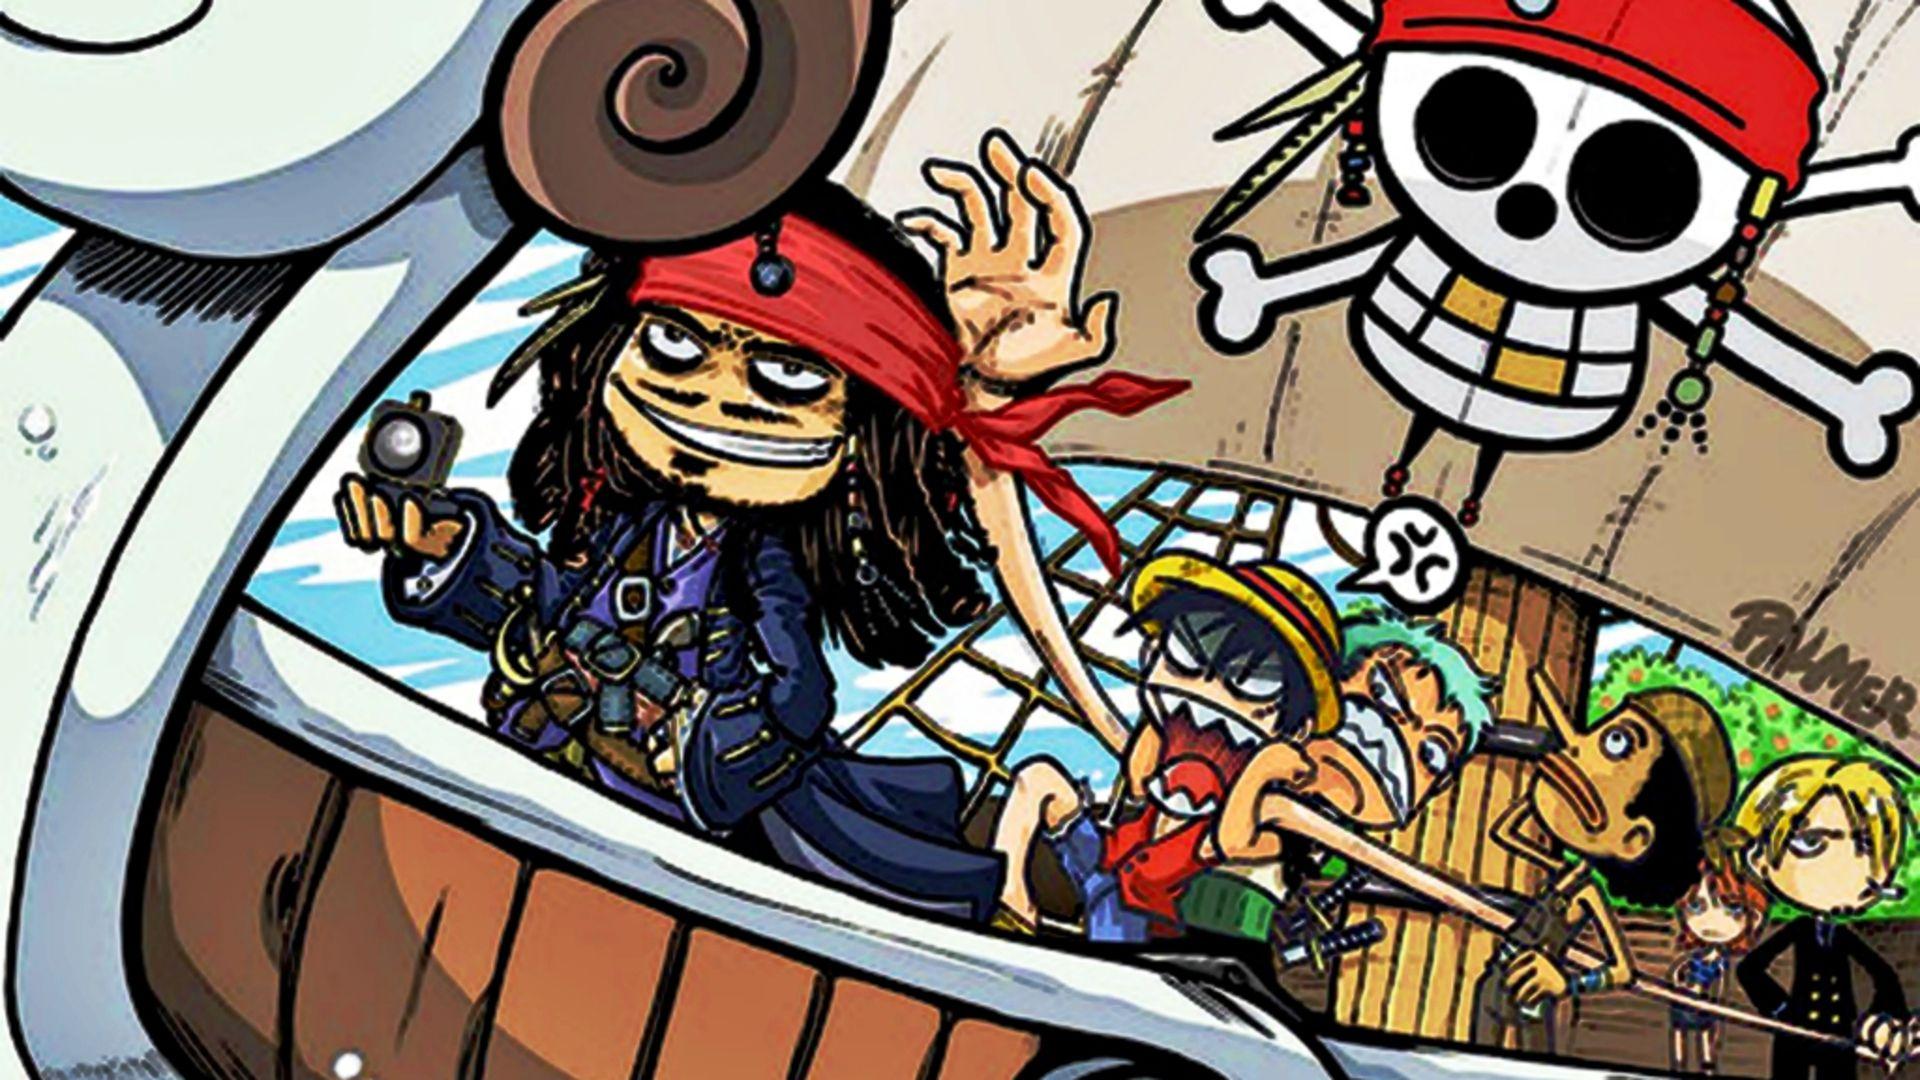 Cartoons One Piece Funny Nami Luffy Zoro Sanji Pirates Of